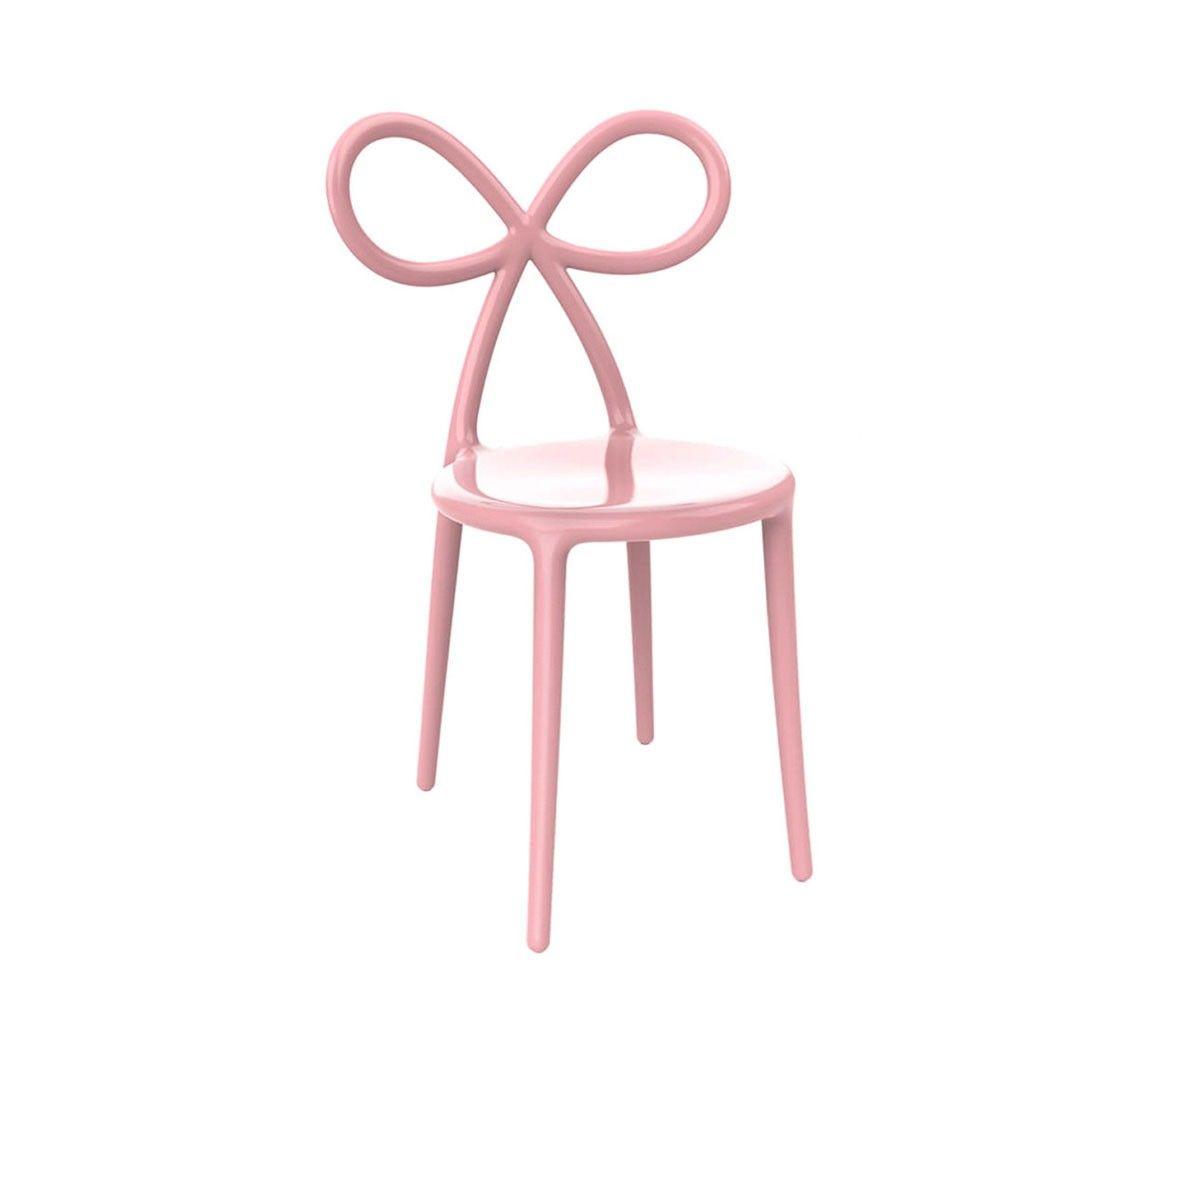 chaise noeud rose nika zupanc designer slov ne l univers girly et d cal signe la chaise. Black Bedroom Furniture Sets. Home Design Ideas